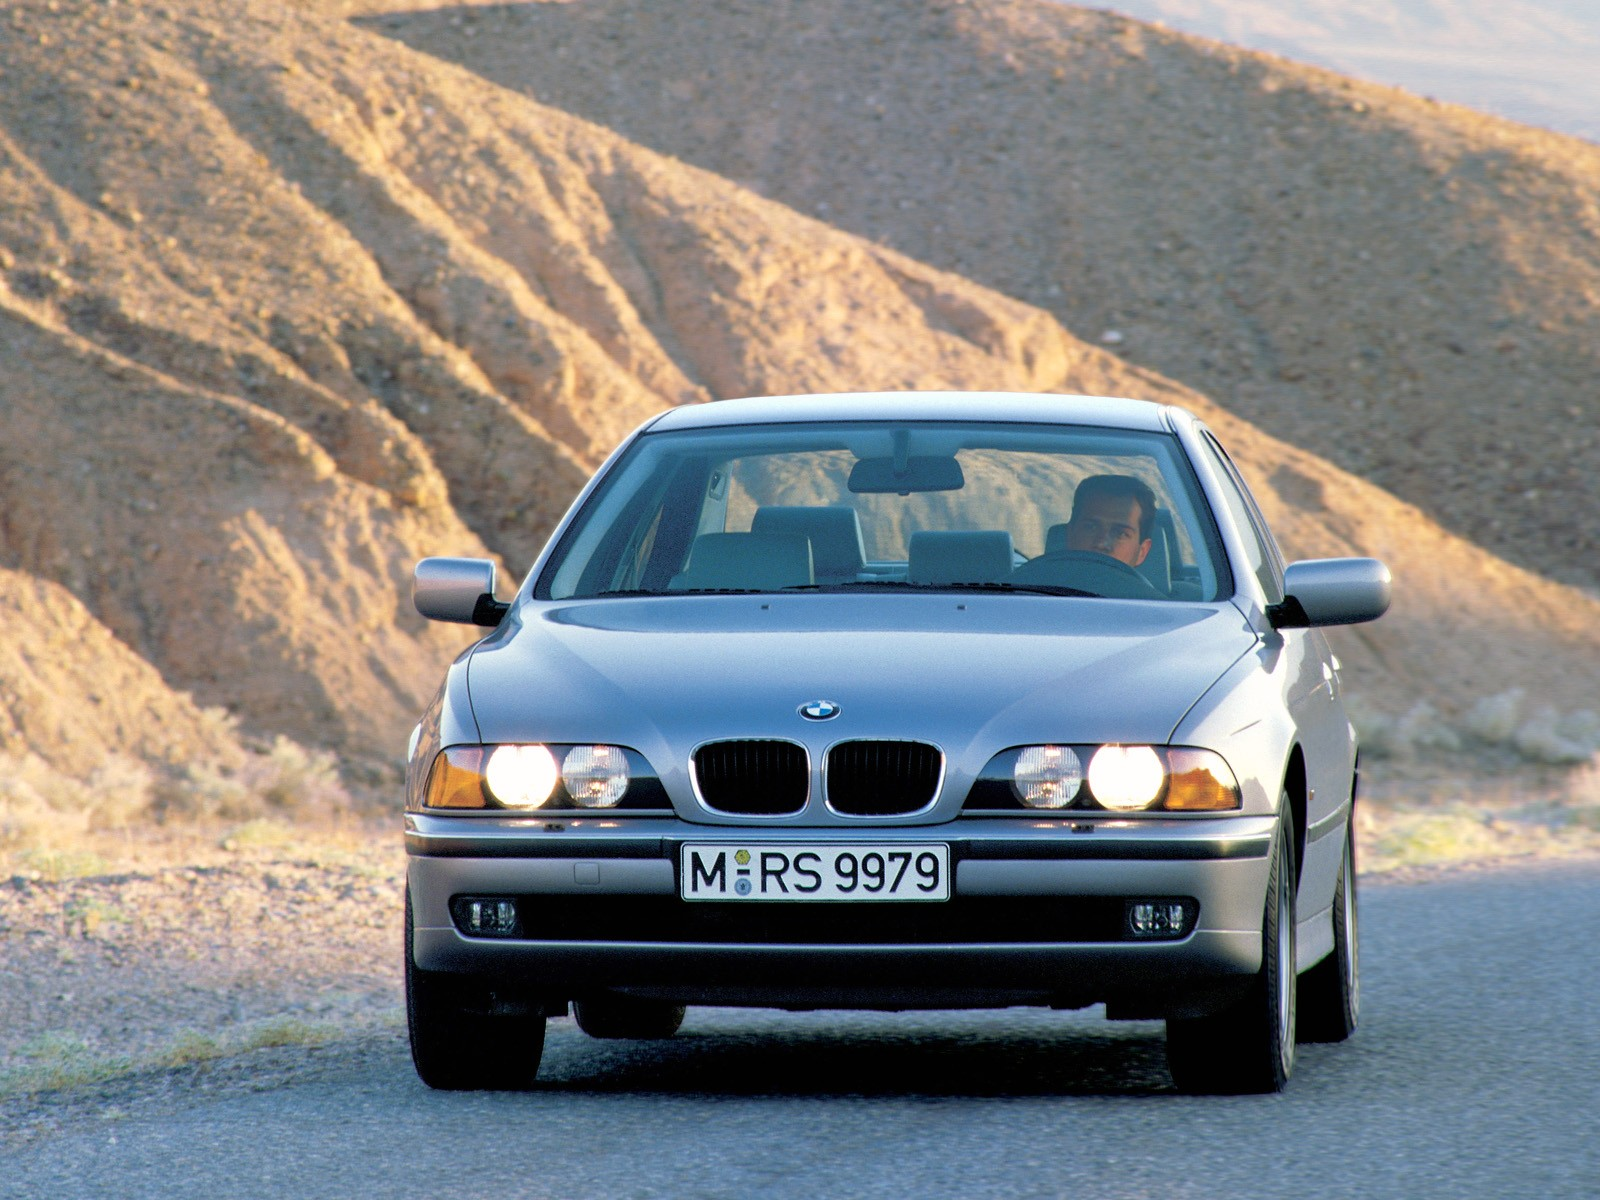 Bmw 5 Series E39 1995 1996 1997 1998 1999 2000